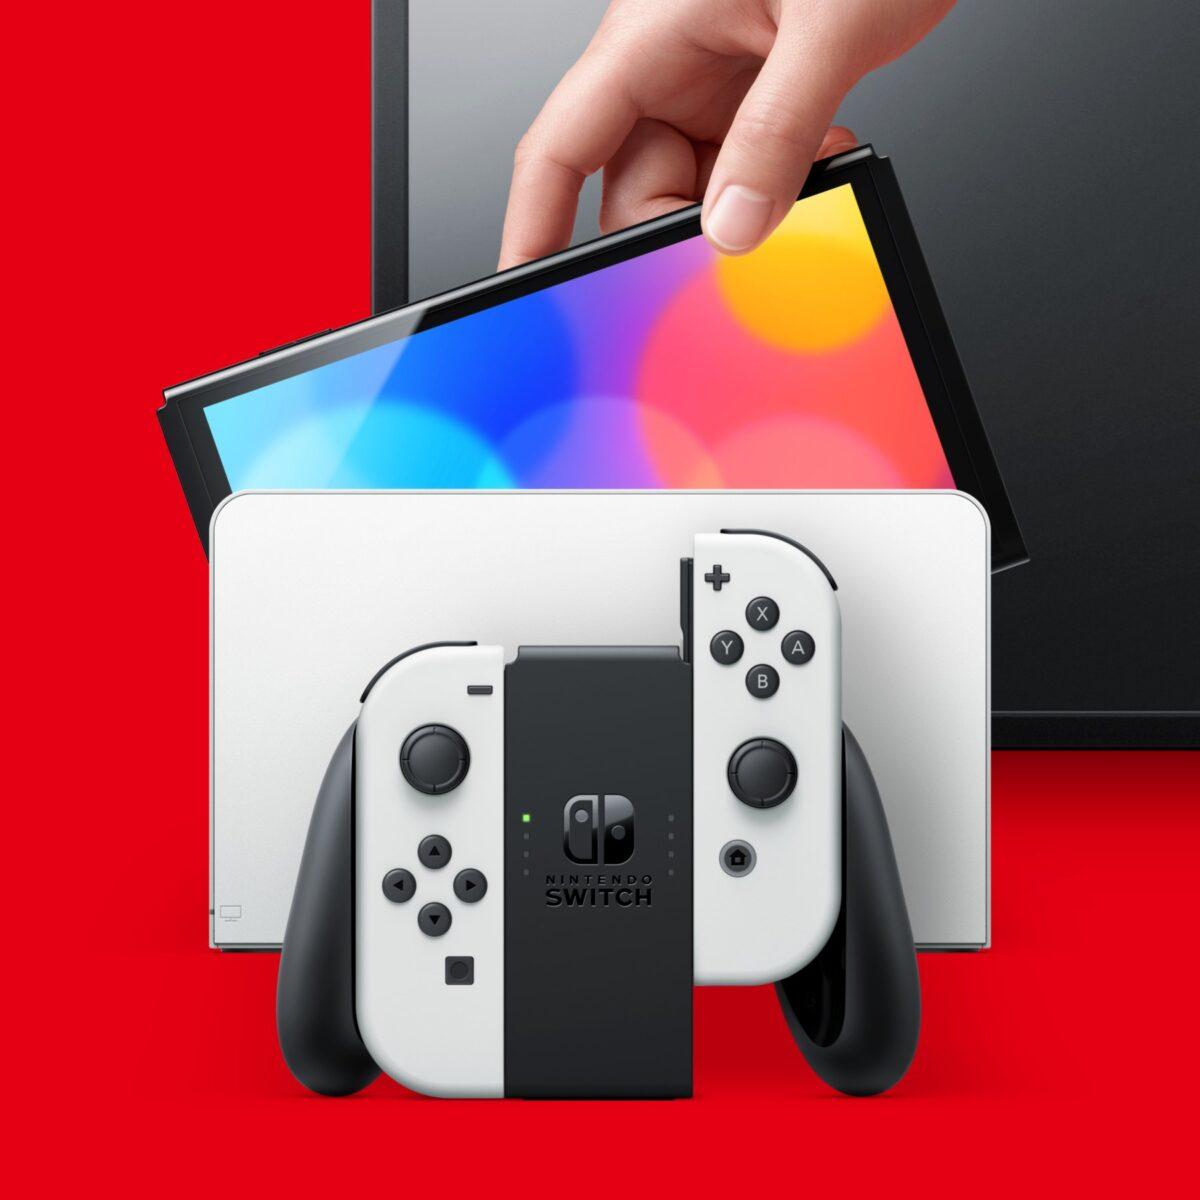 Nintendo Switch 7 inch OLED